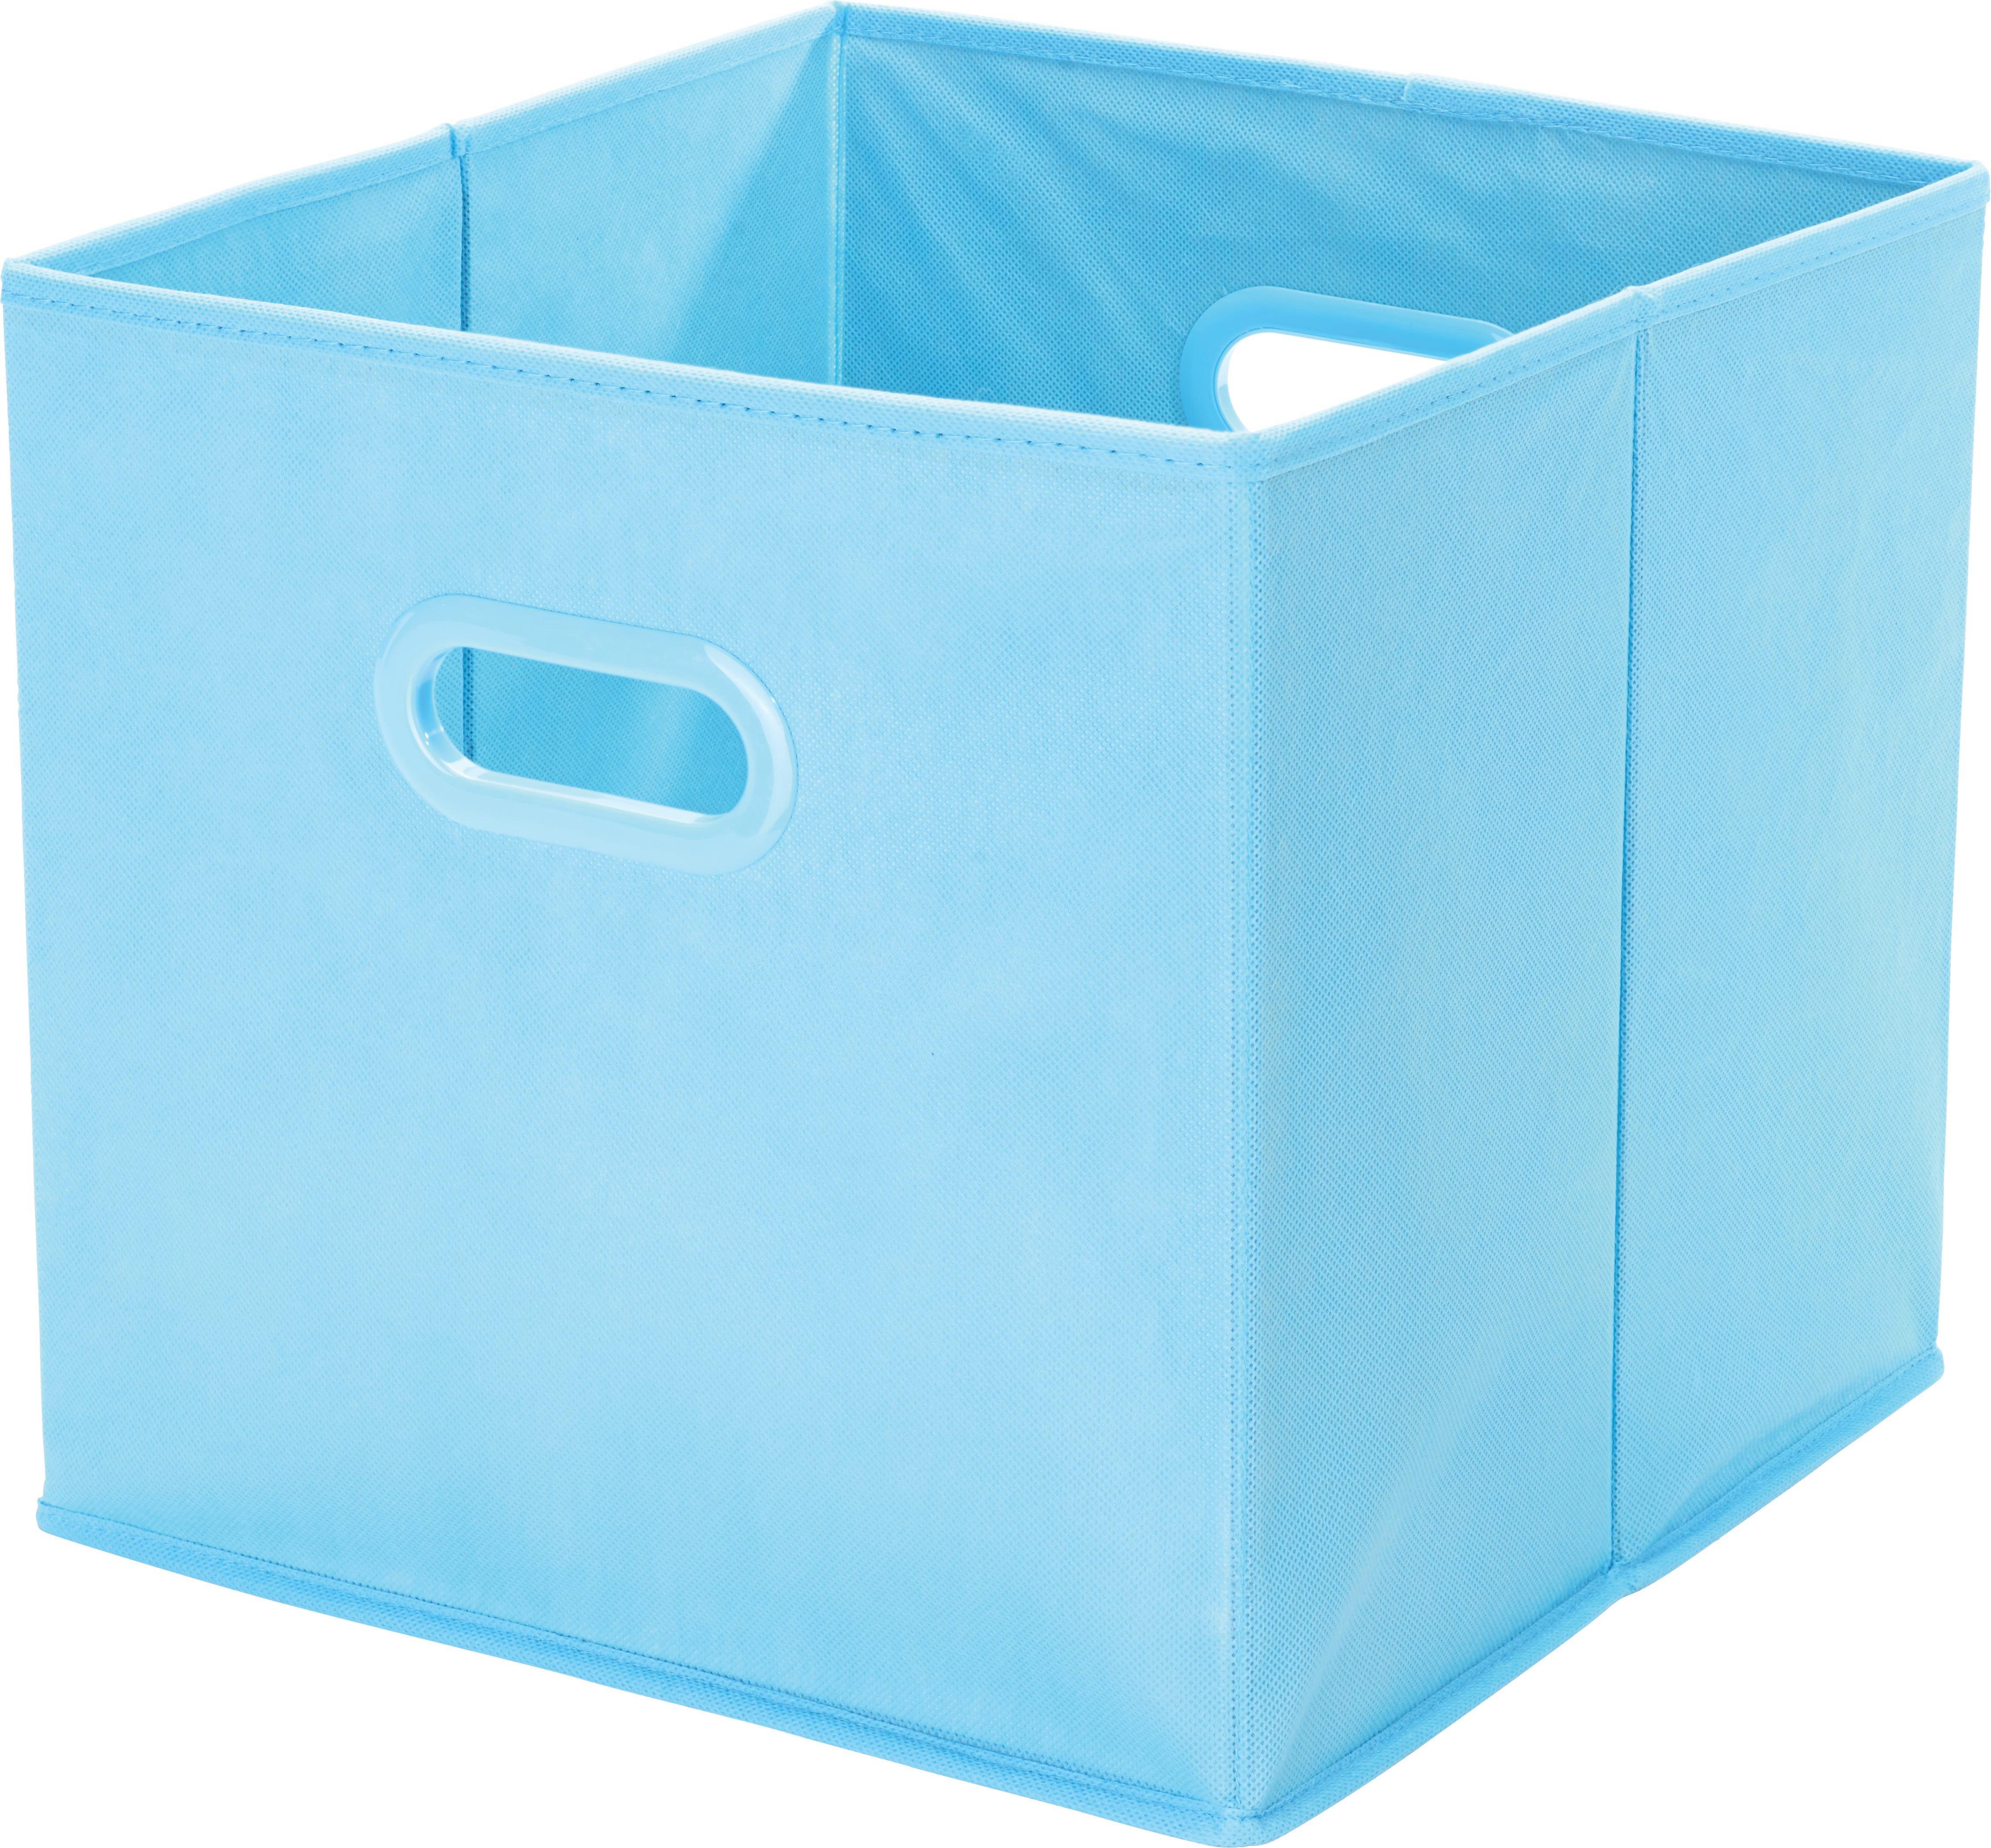 Tárolódoboz Elli - türkiz, konvencionális, műanyag/karton (33/33/32cm) - MÖMAX modern living